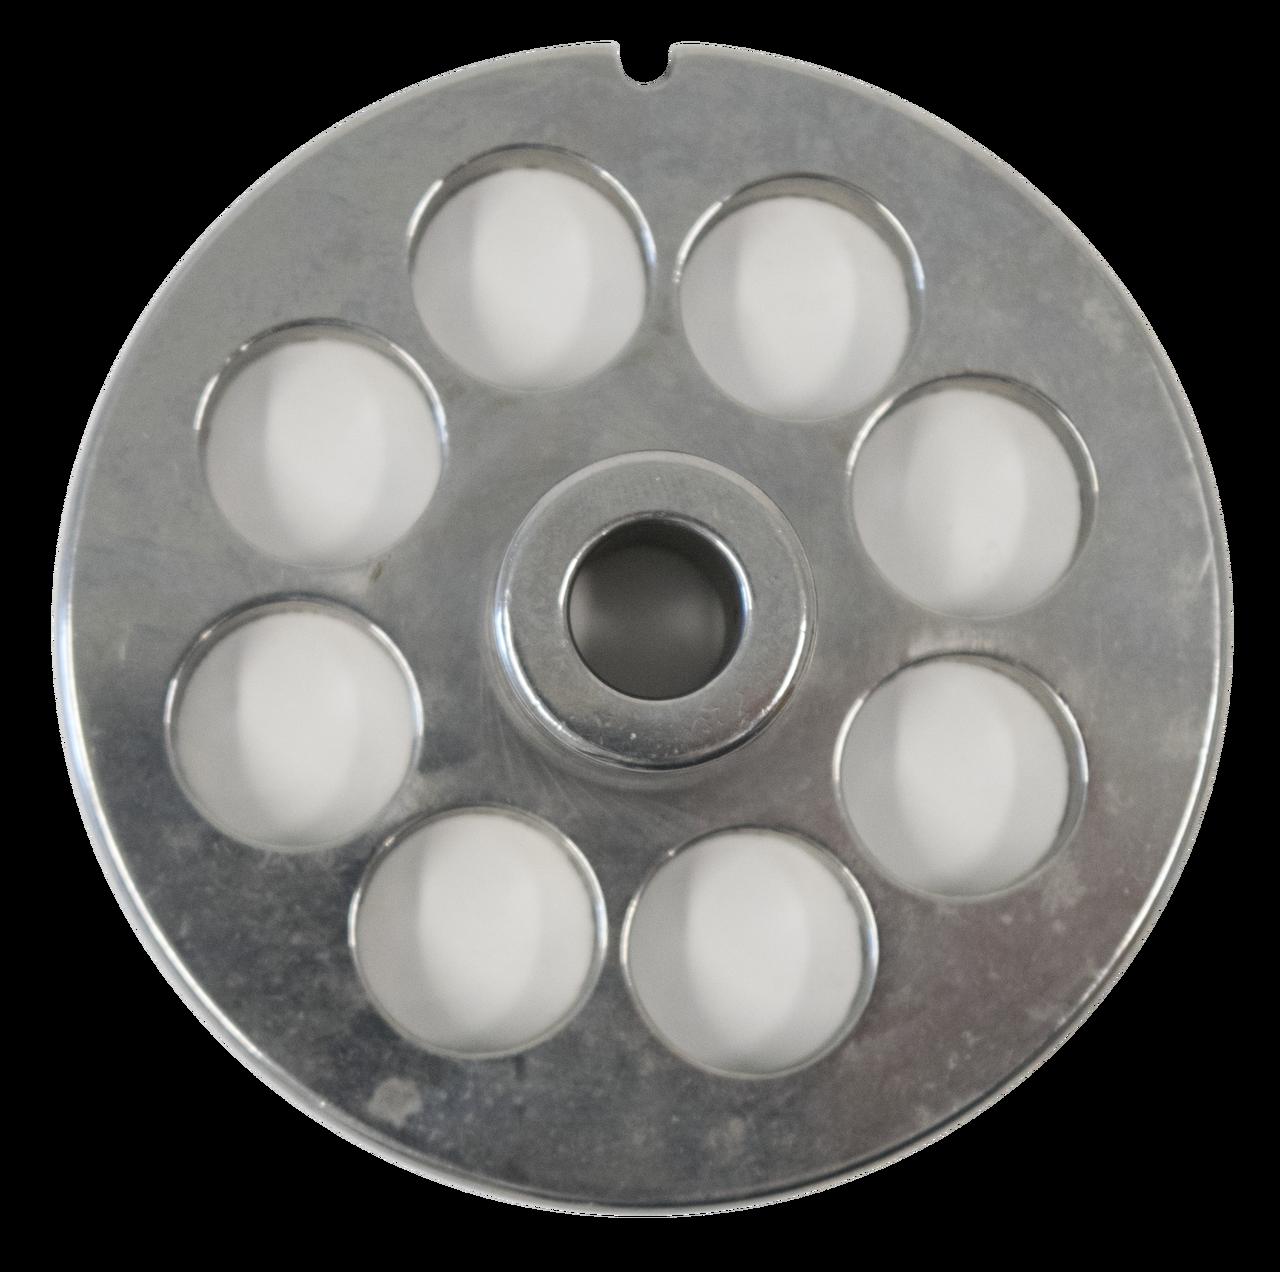 American Eagle Food Machinery #22 Meat Grinder Plate, 16mm, 5/8 inch, AE-G22N/06-16